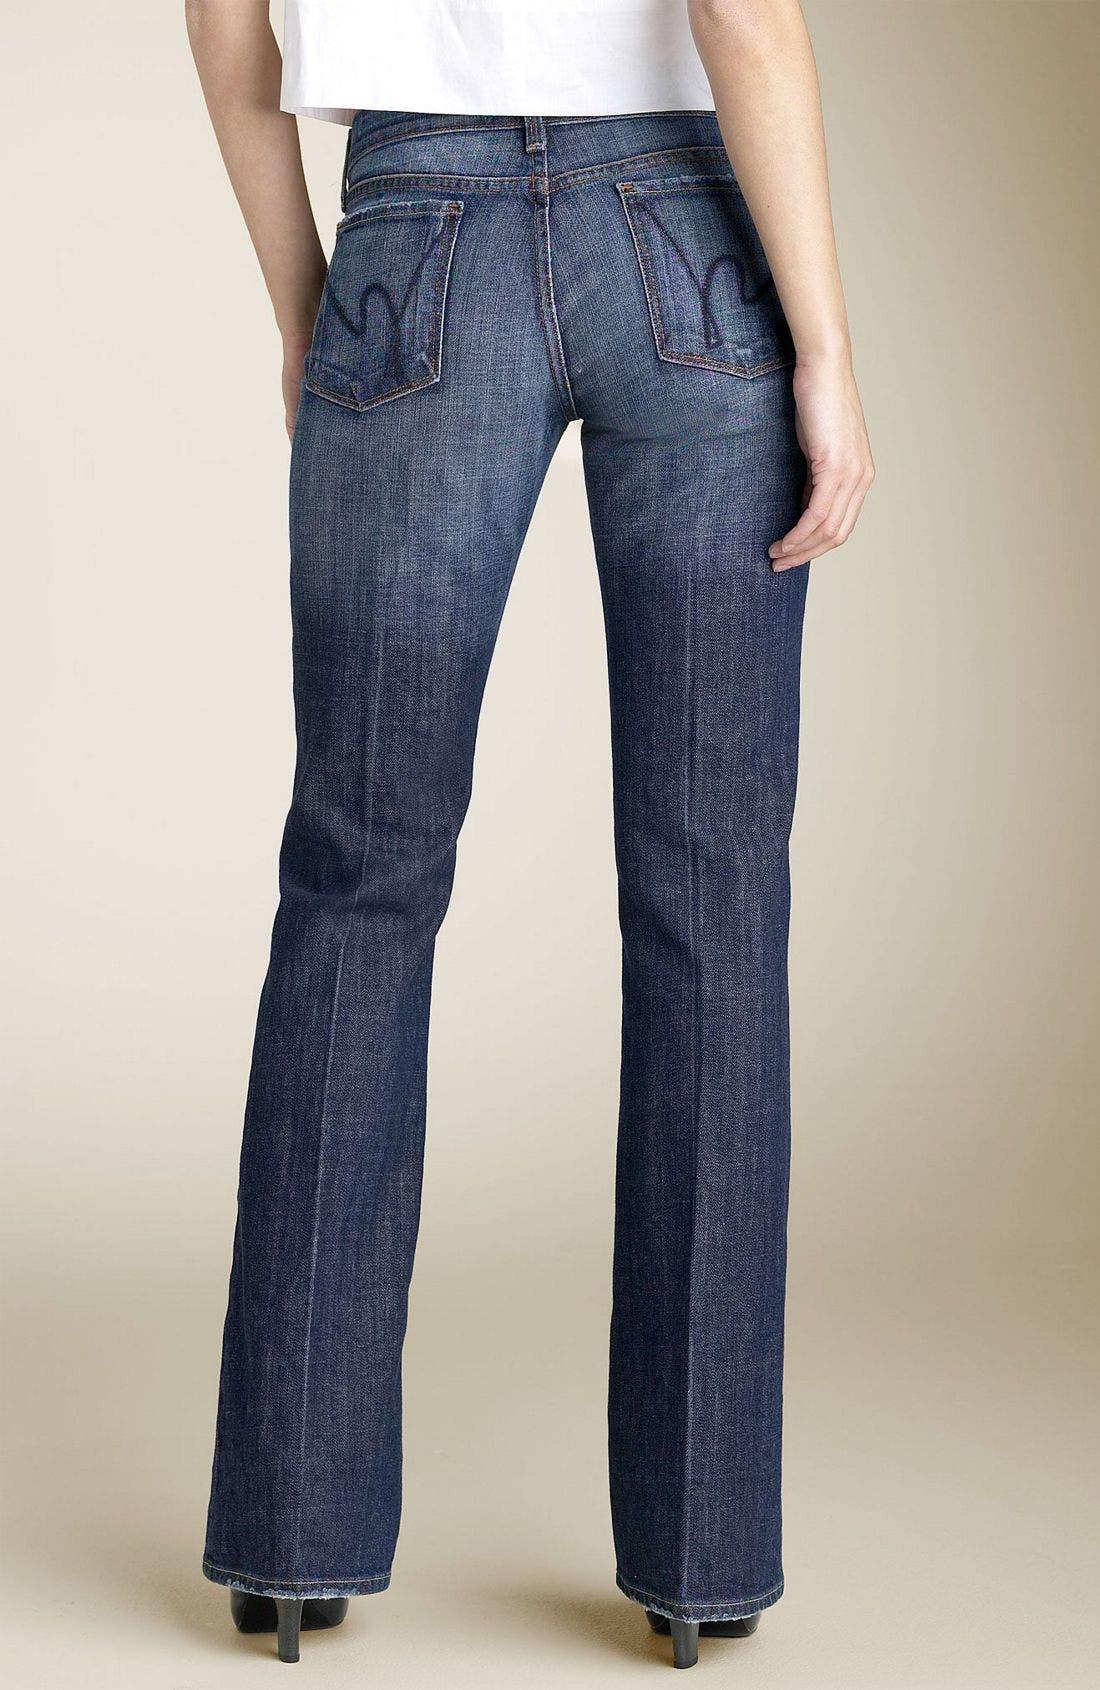 'Dita' Bootcut Stretch Jeans,                             Alternate thumbnail 2, color,                             404